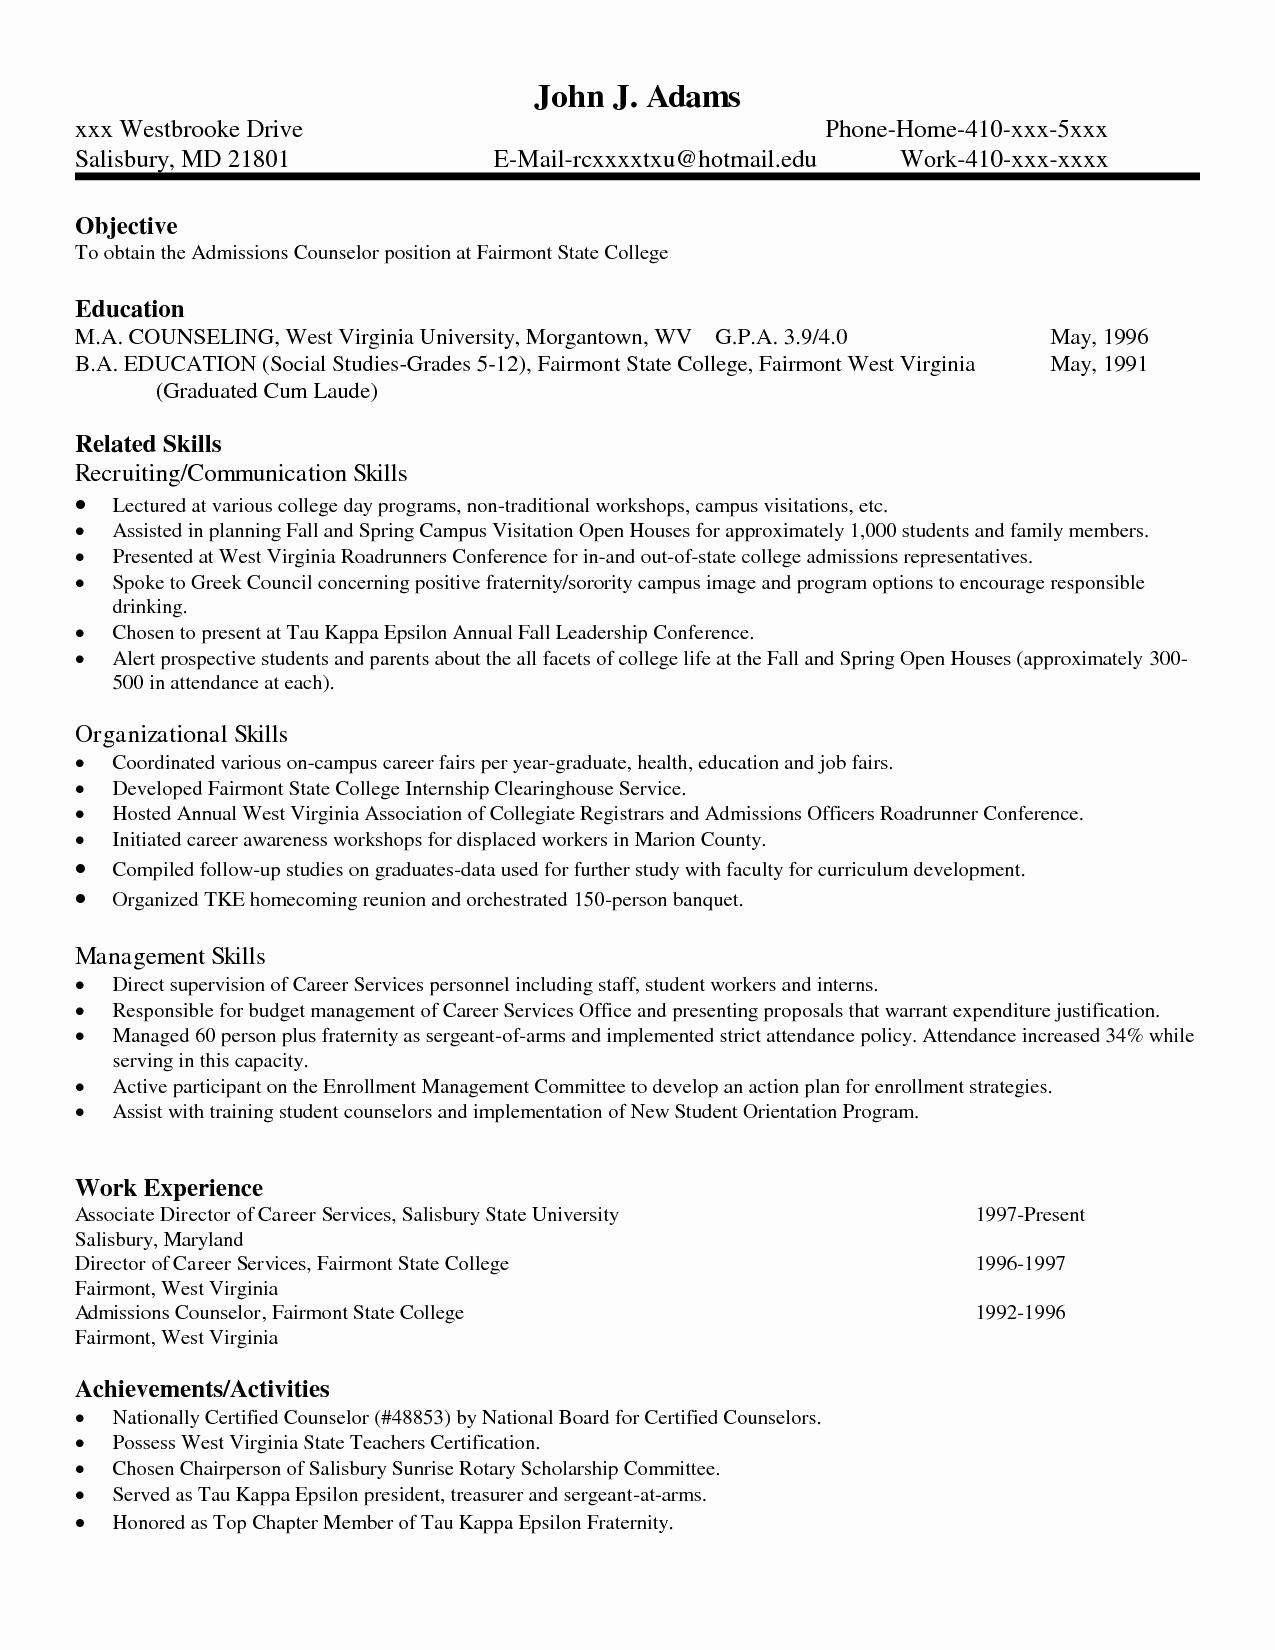 Skills Resume